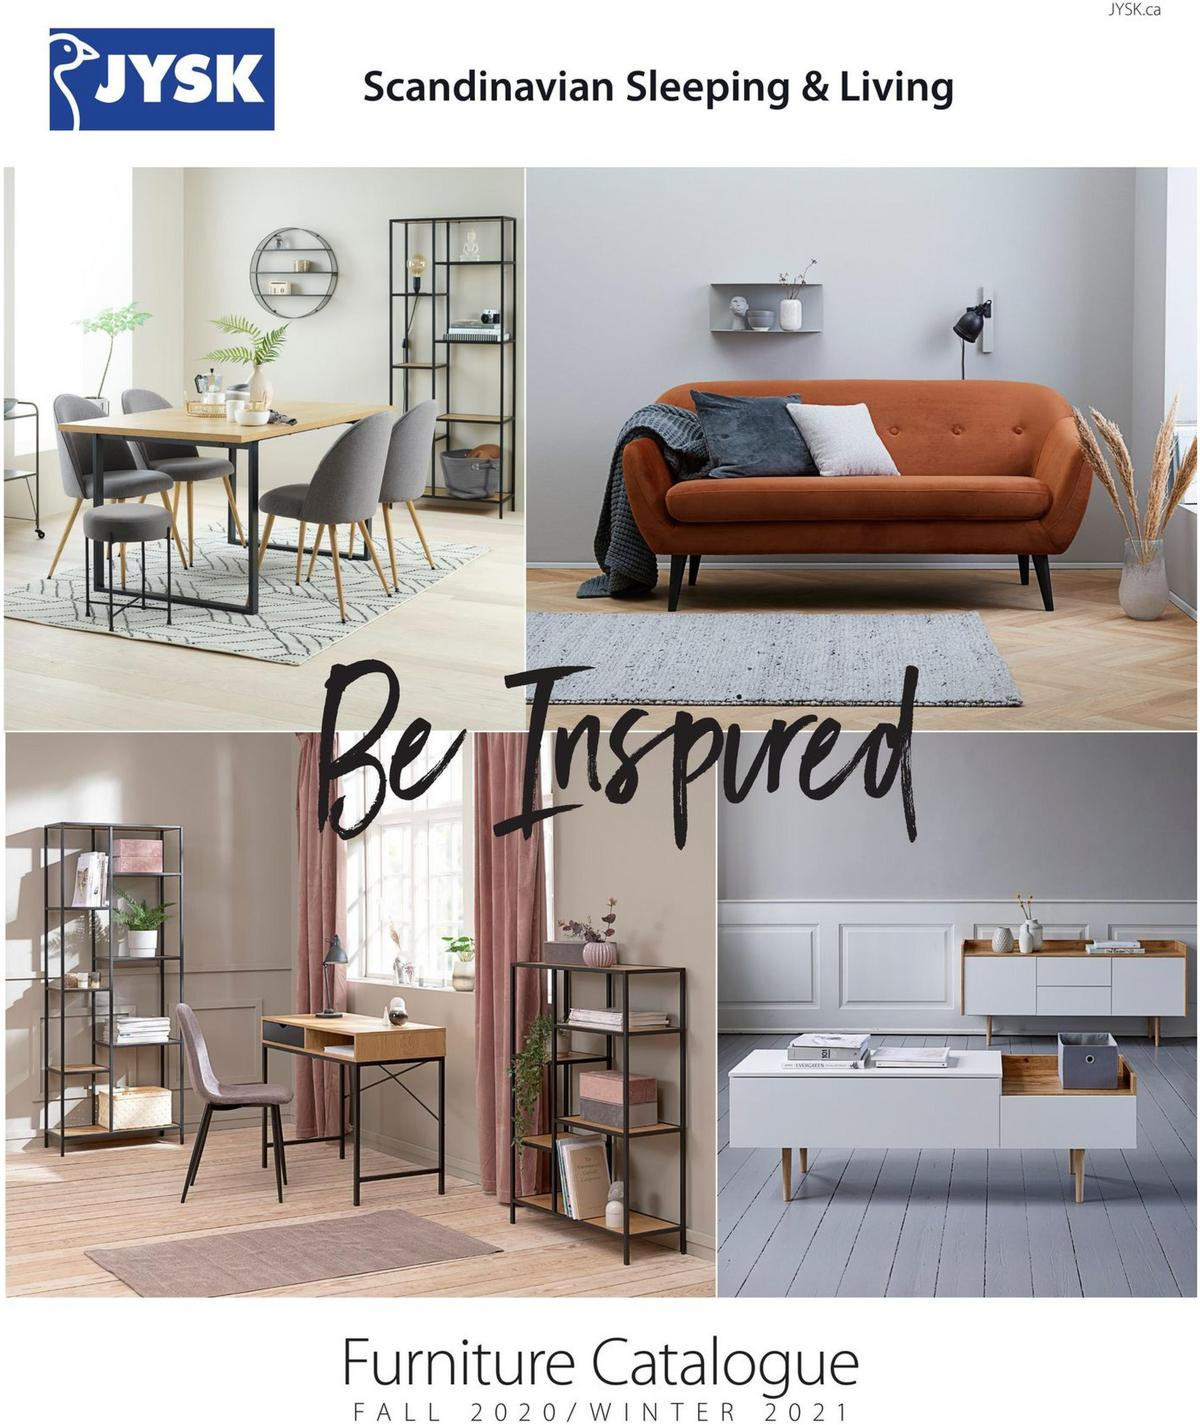 JYSK Furniture Catalogue Flyer from December 3